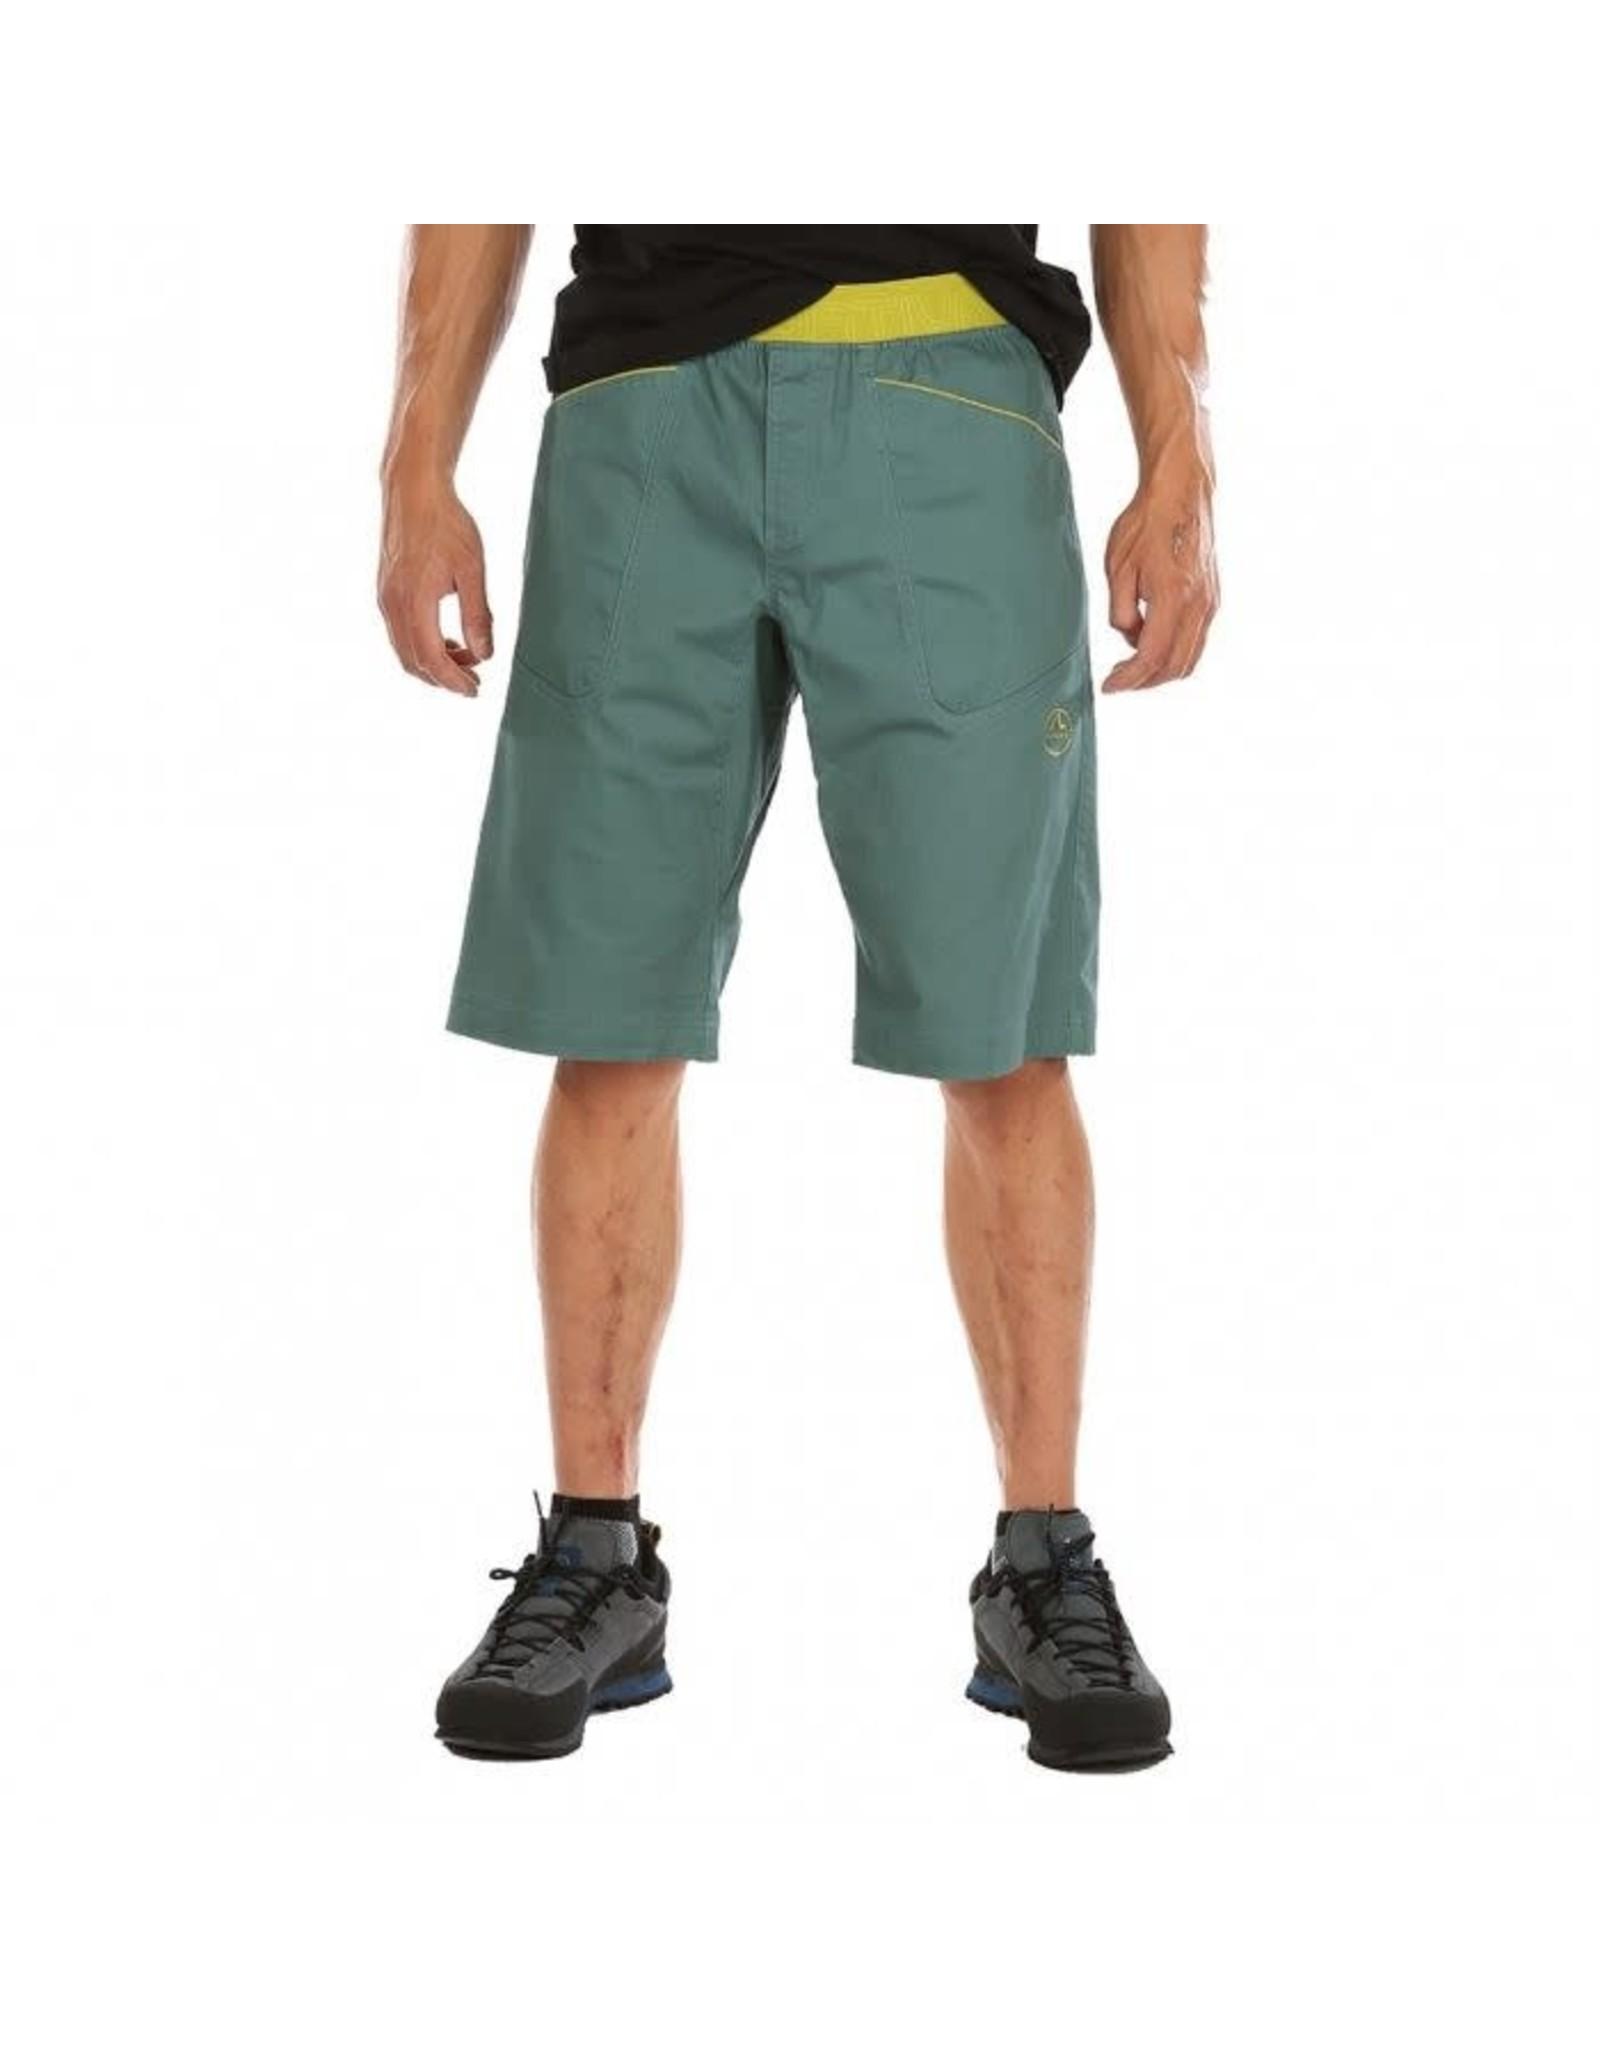 La Sportiva Shorts La Sportiva Flatanger - Homme